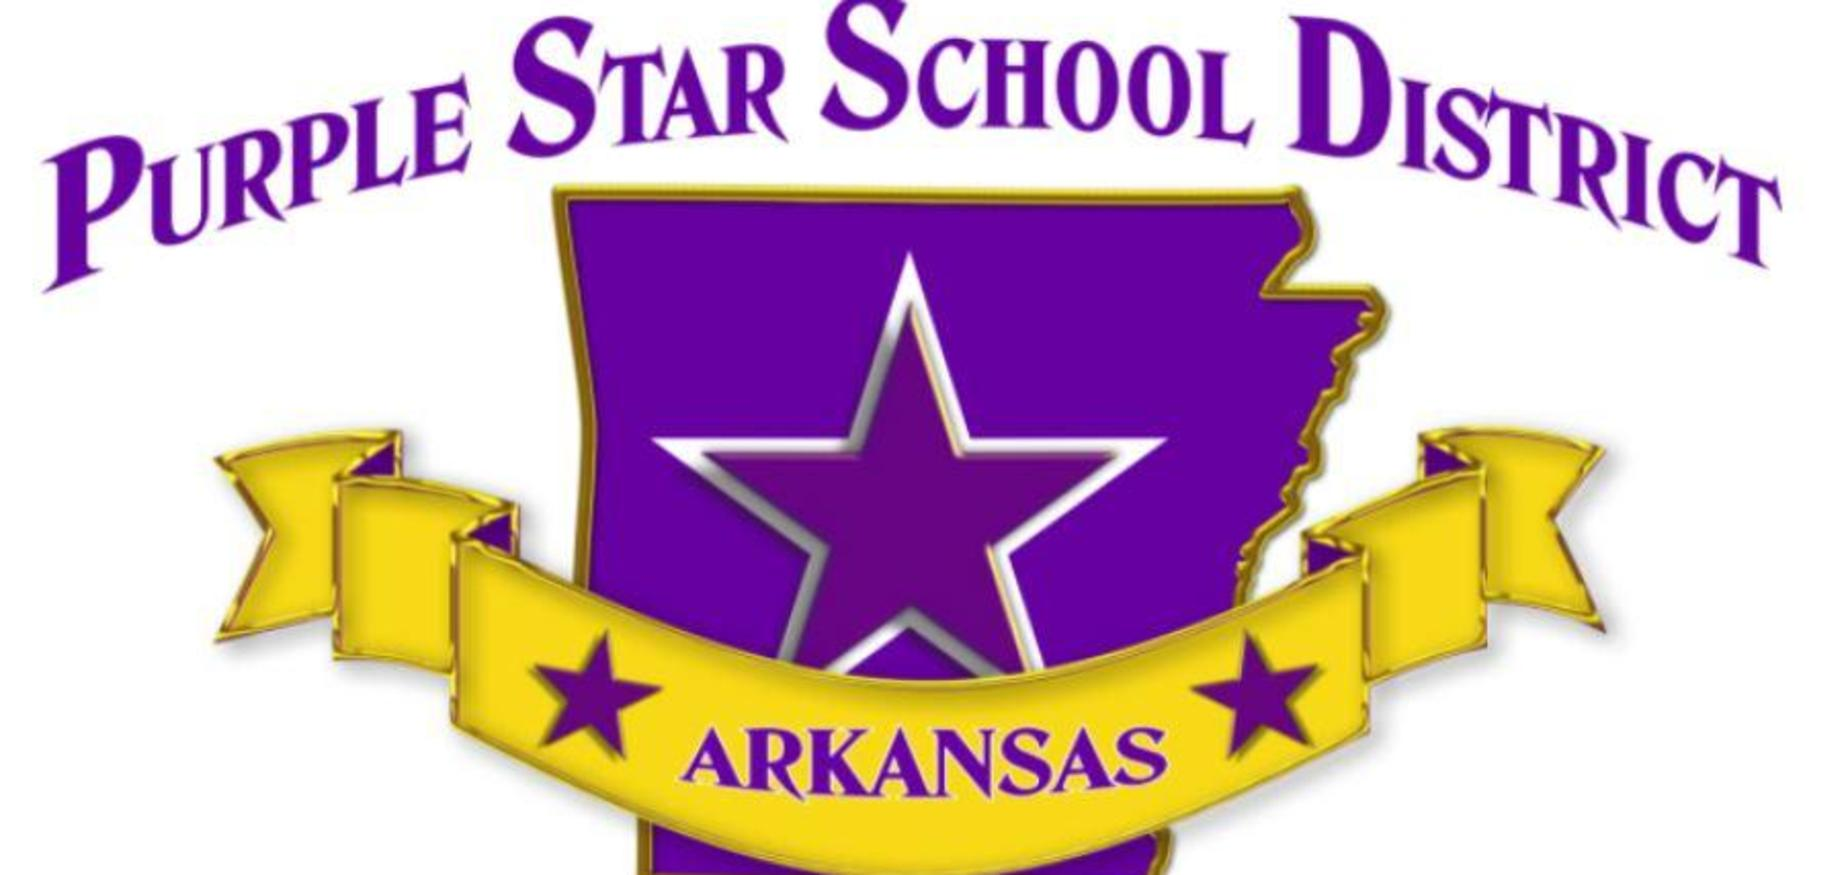 Purple Star School District graphic